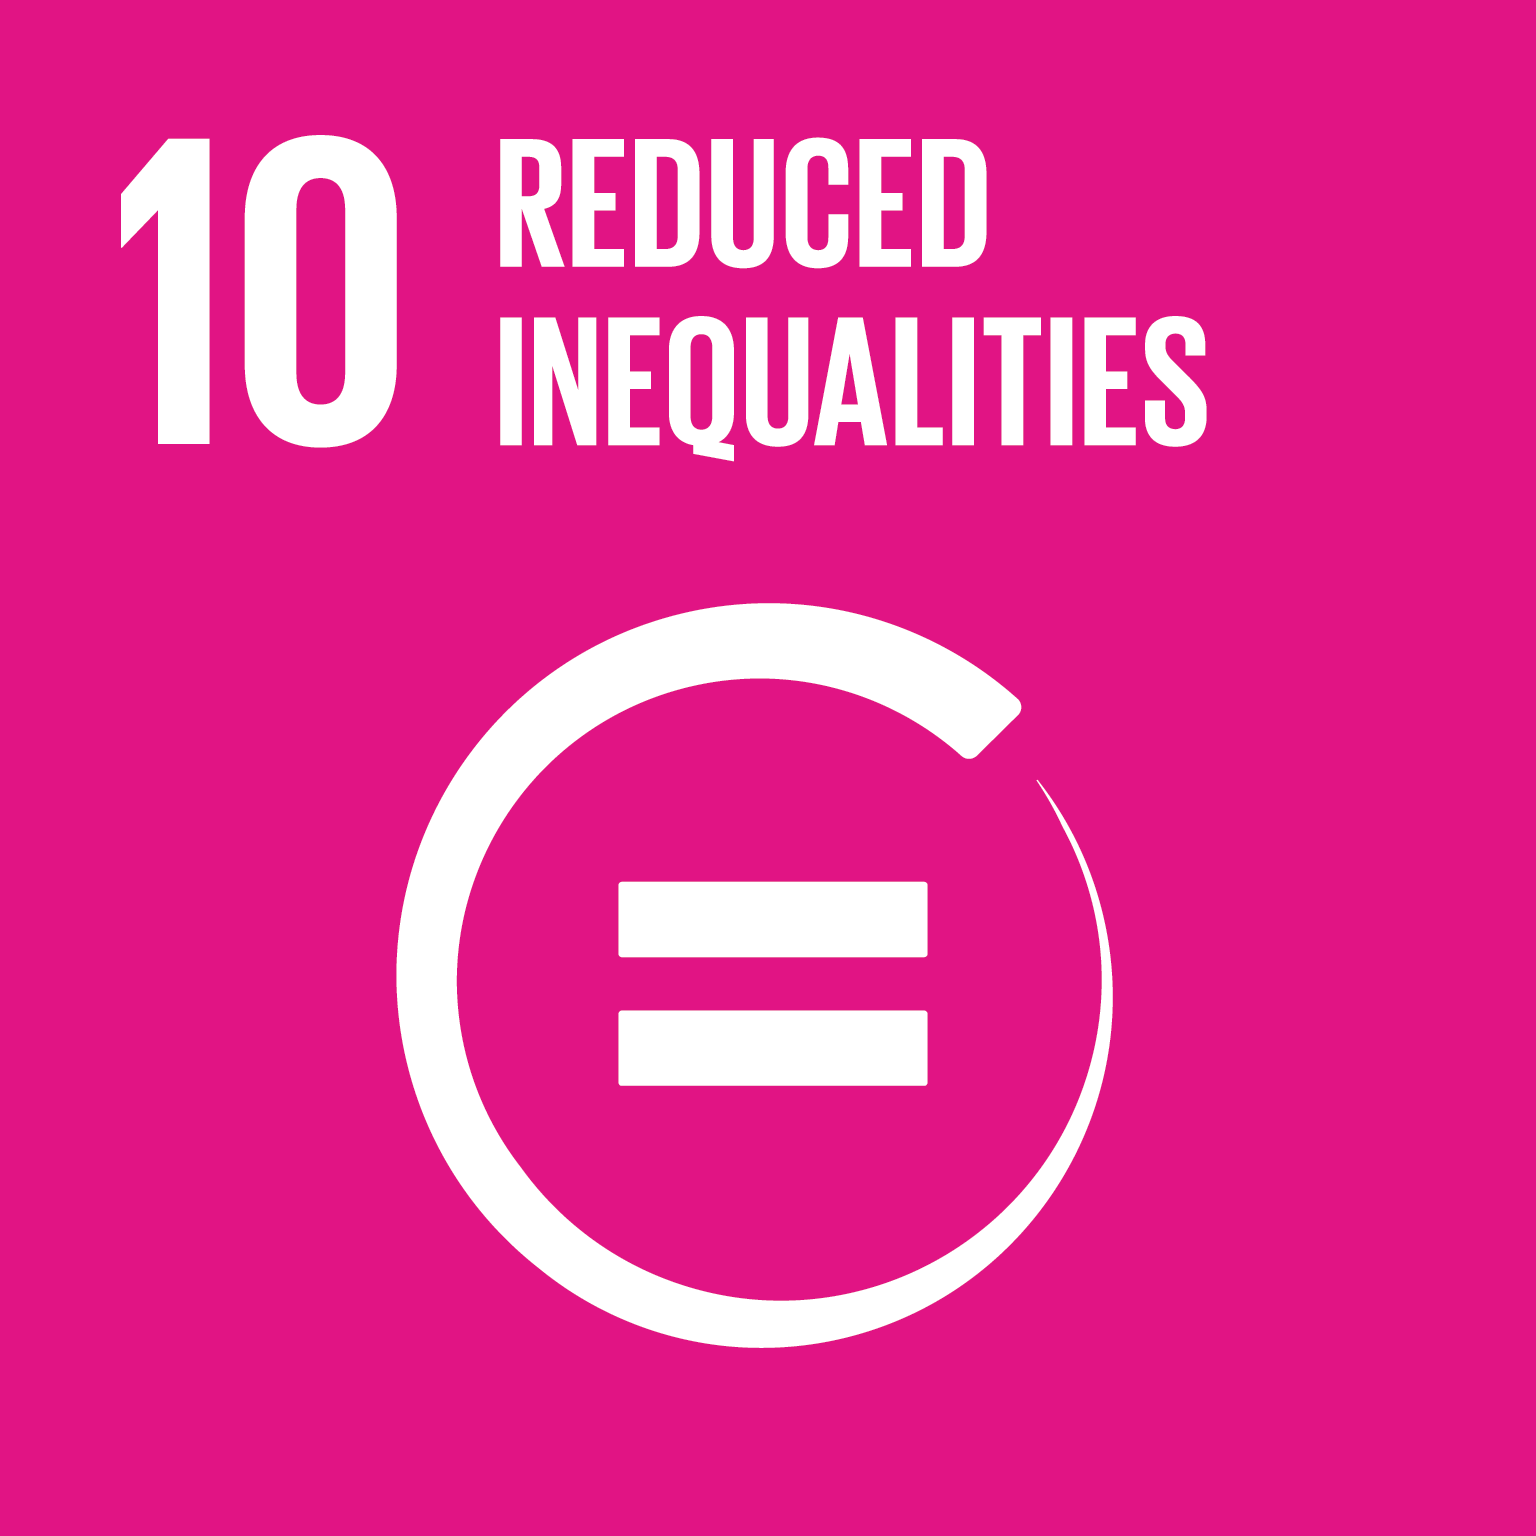 SDG Goal #10 Reduced Inequalities